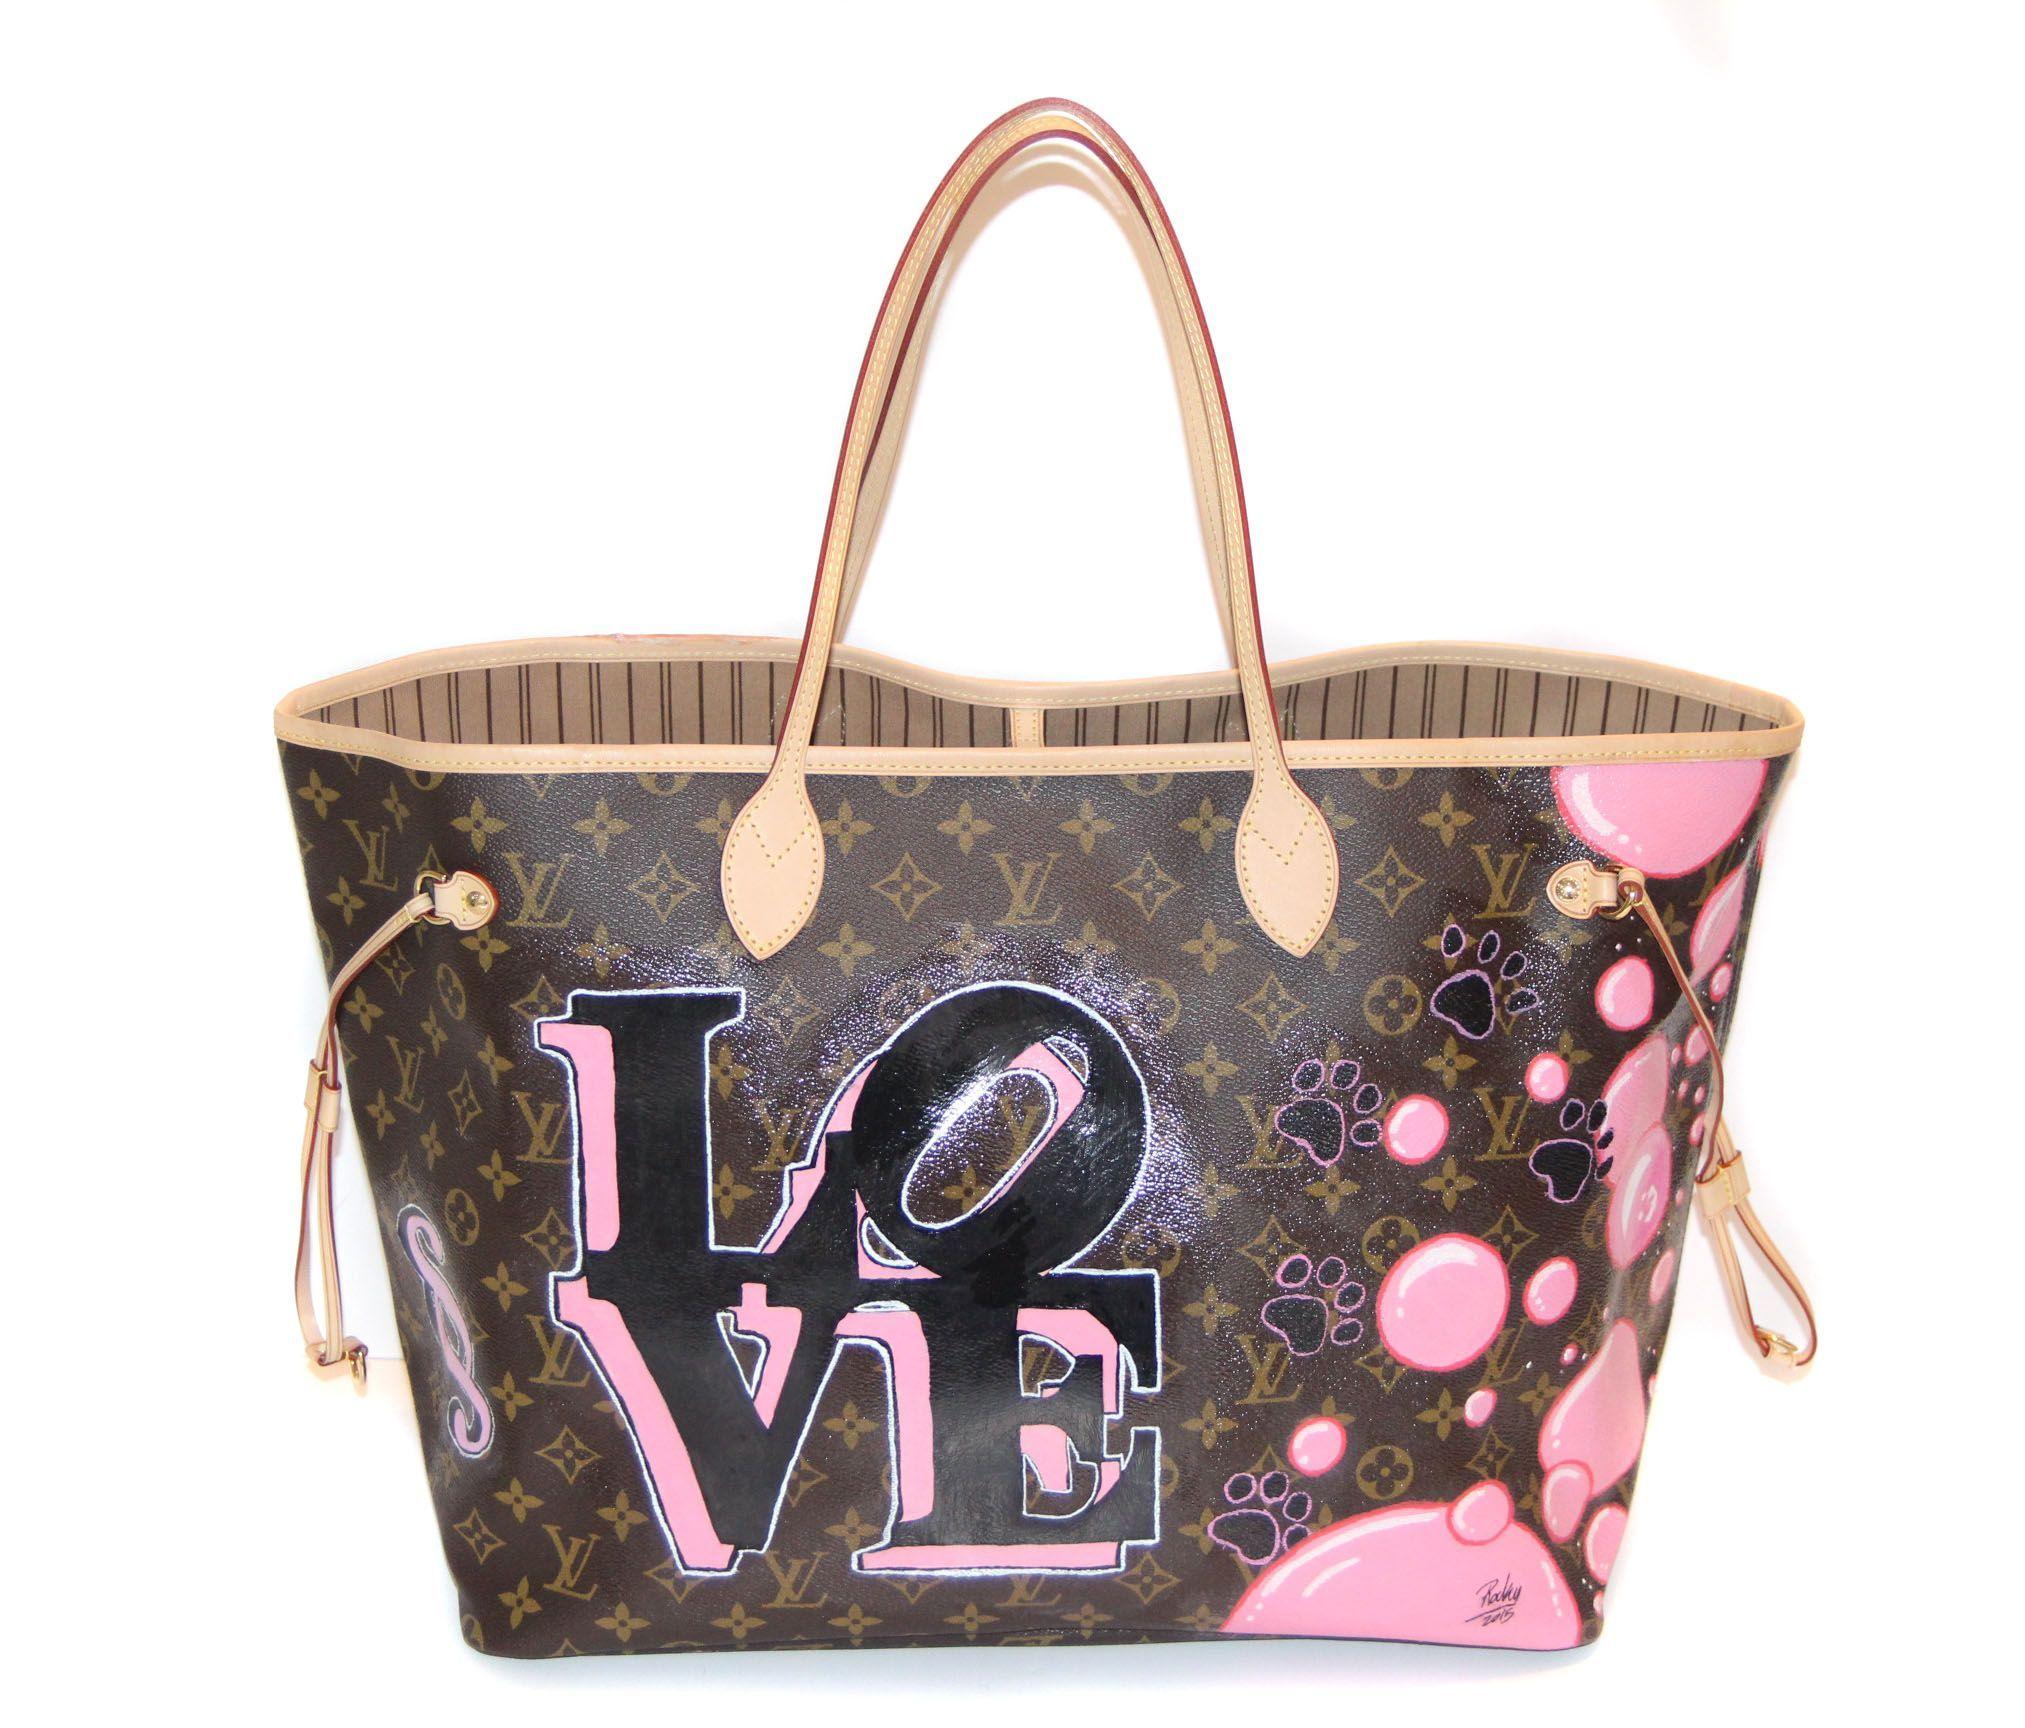 GORGEOUS Louis Vuitton Neverfull MM Monogram Handbag